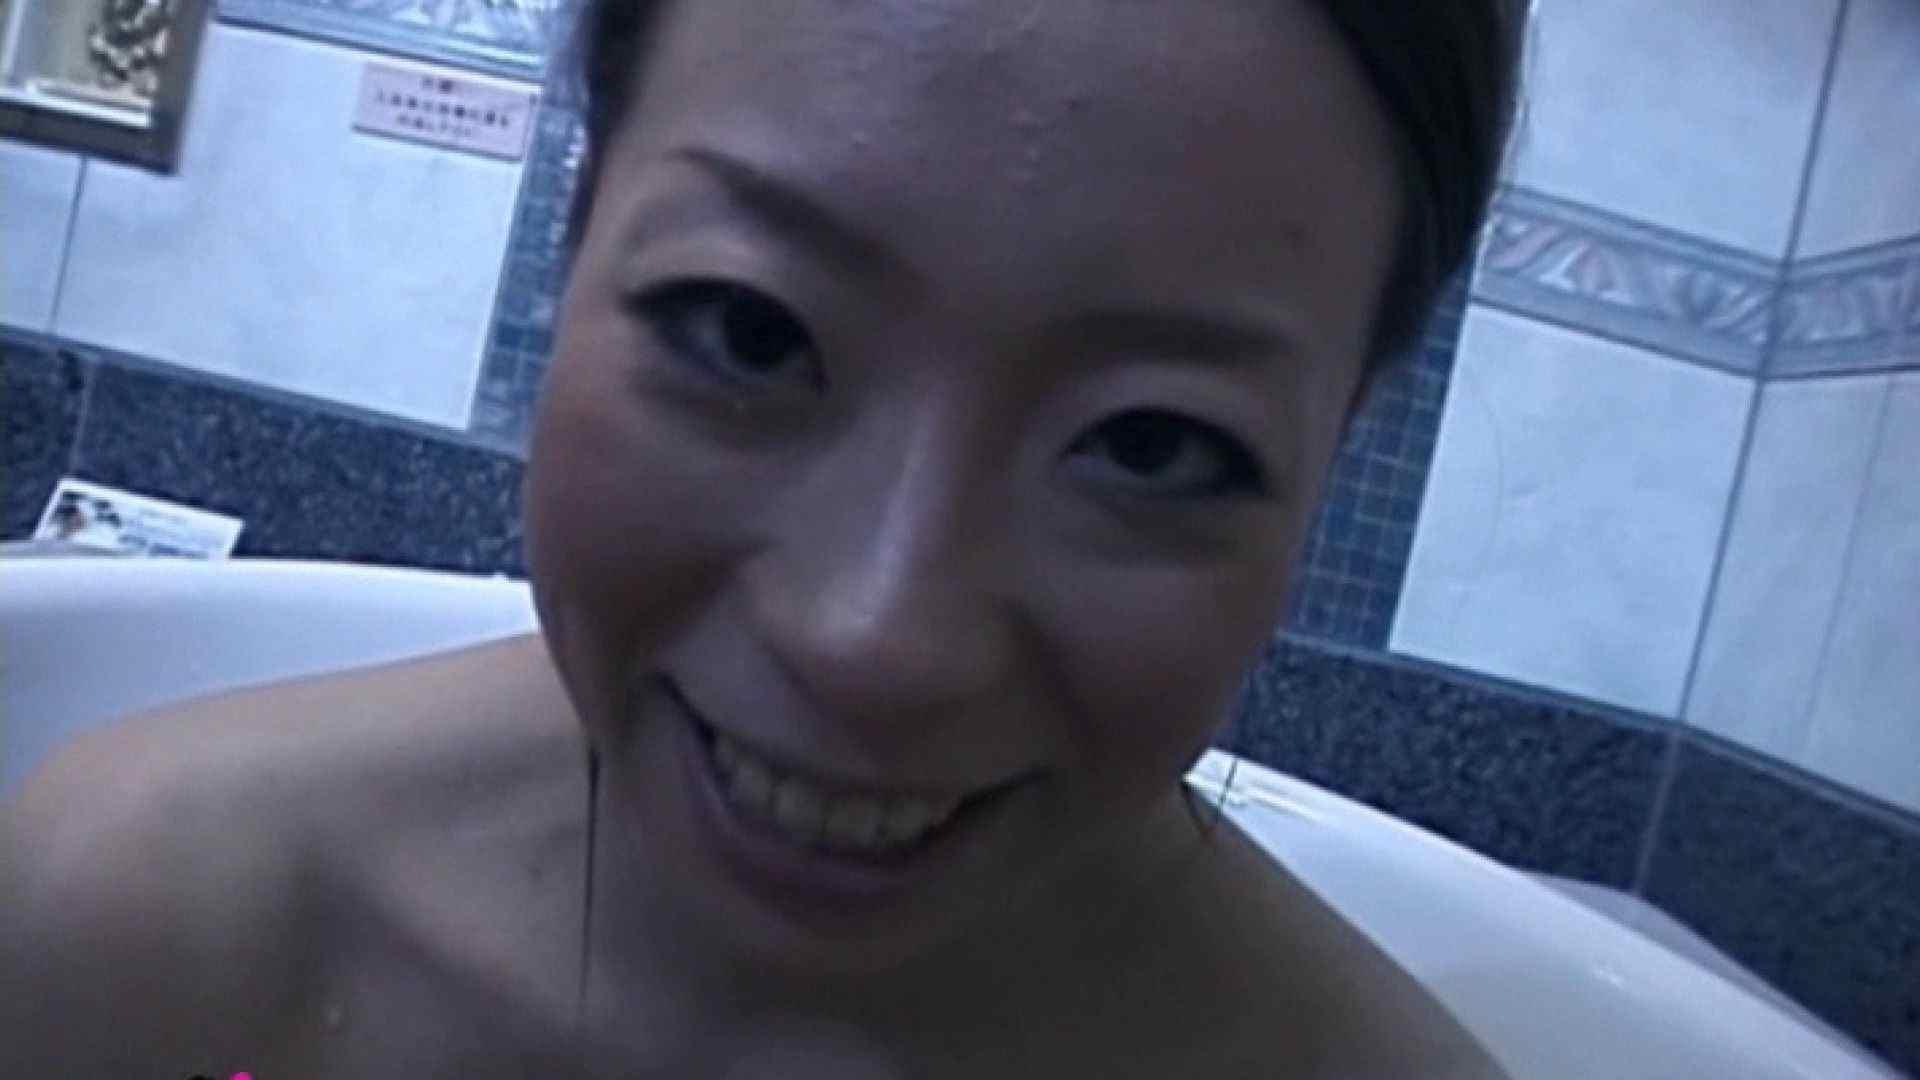 S級厳選美女ビッチガールVol.31 前編 美女  54pic 44